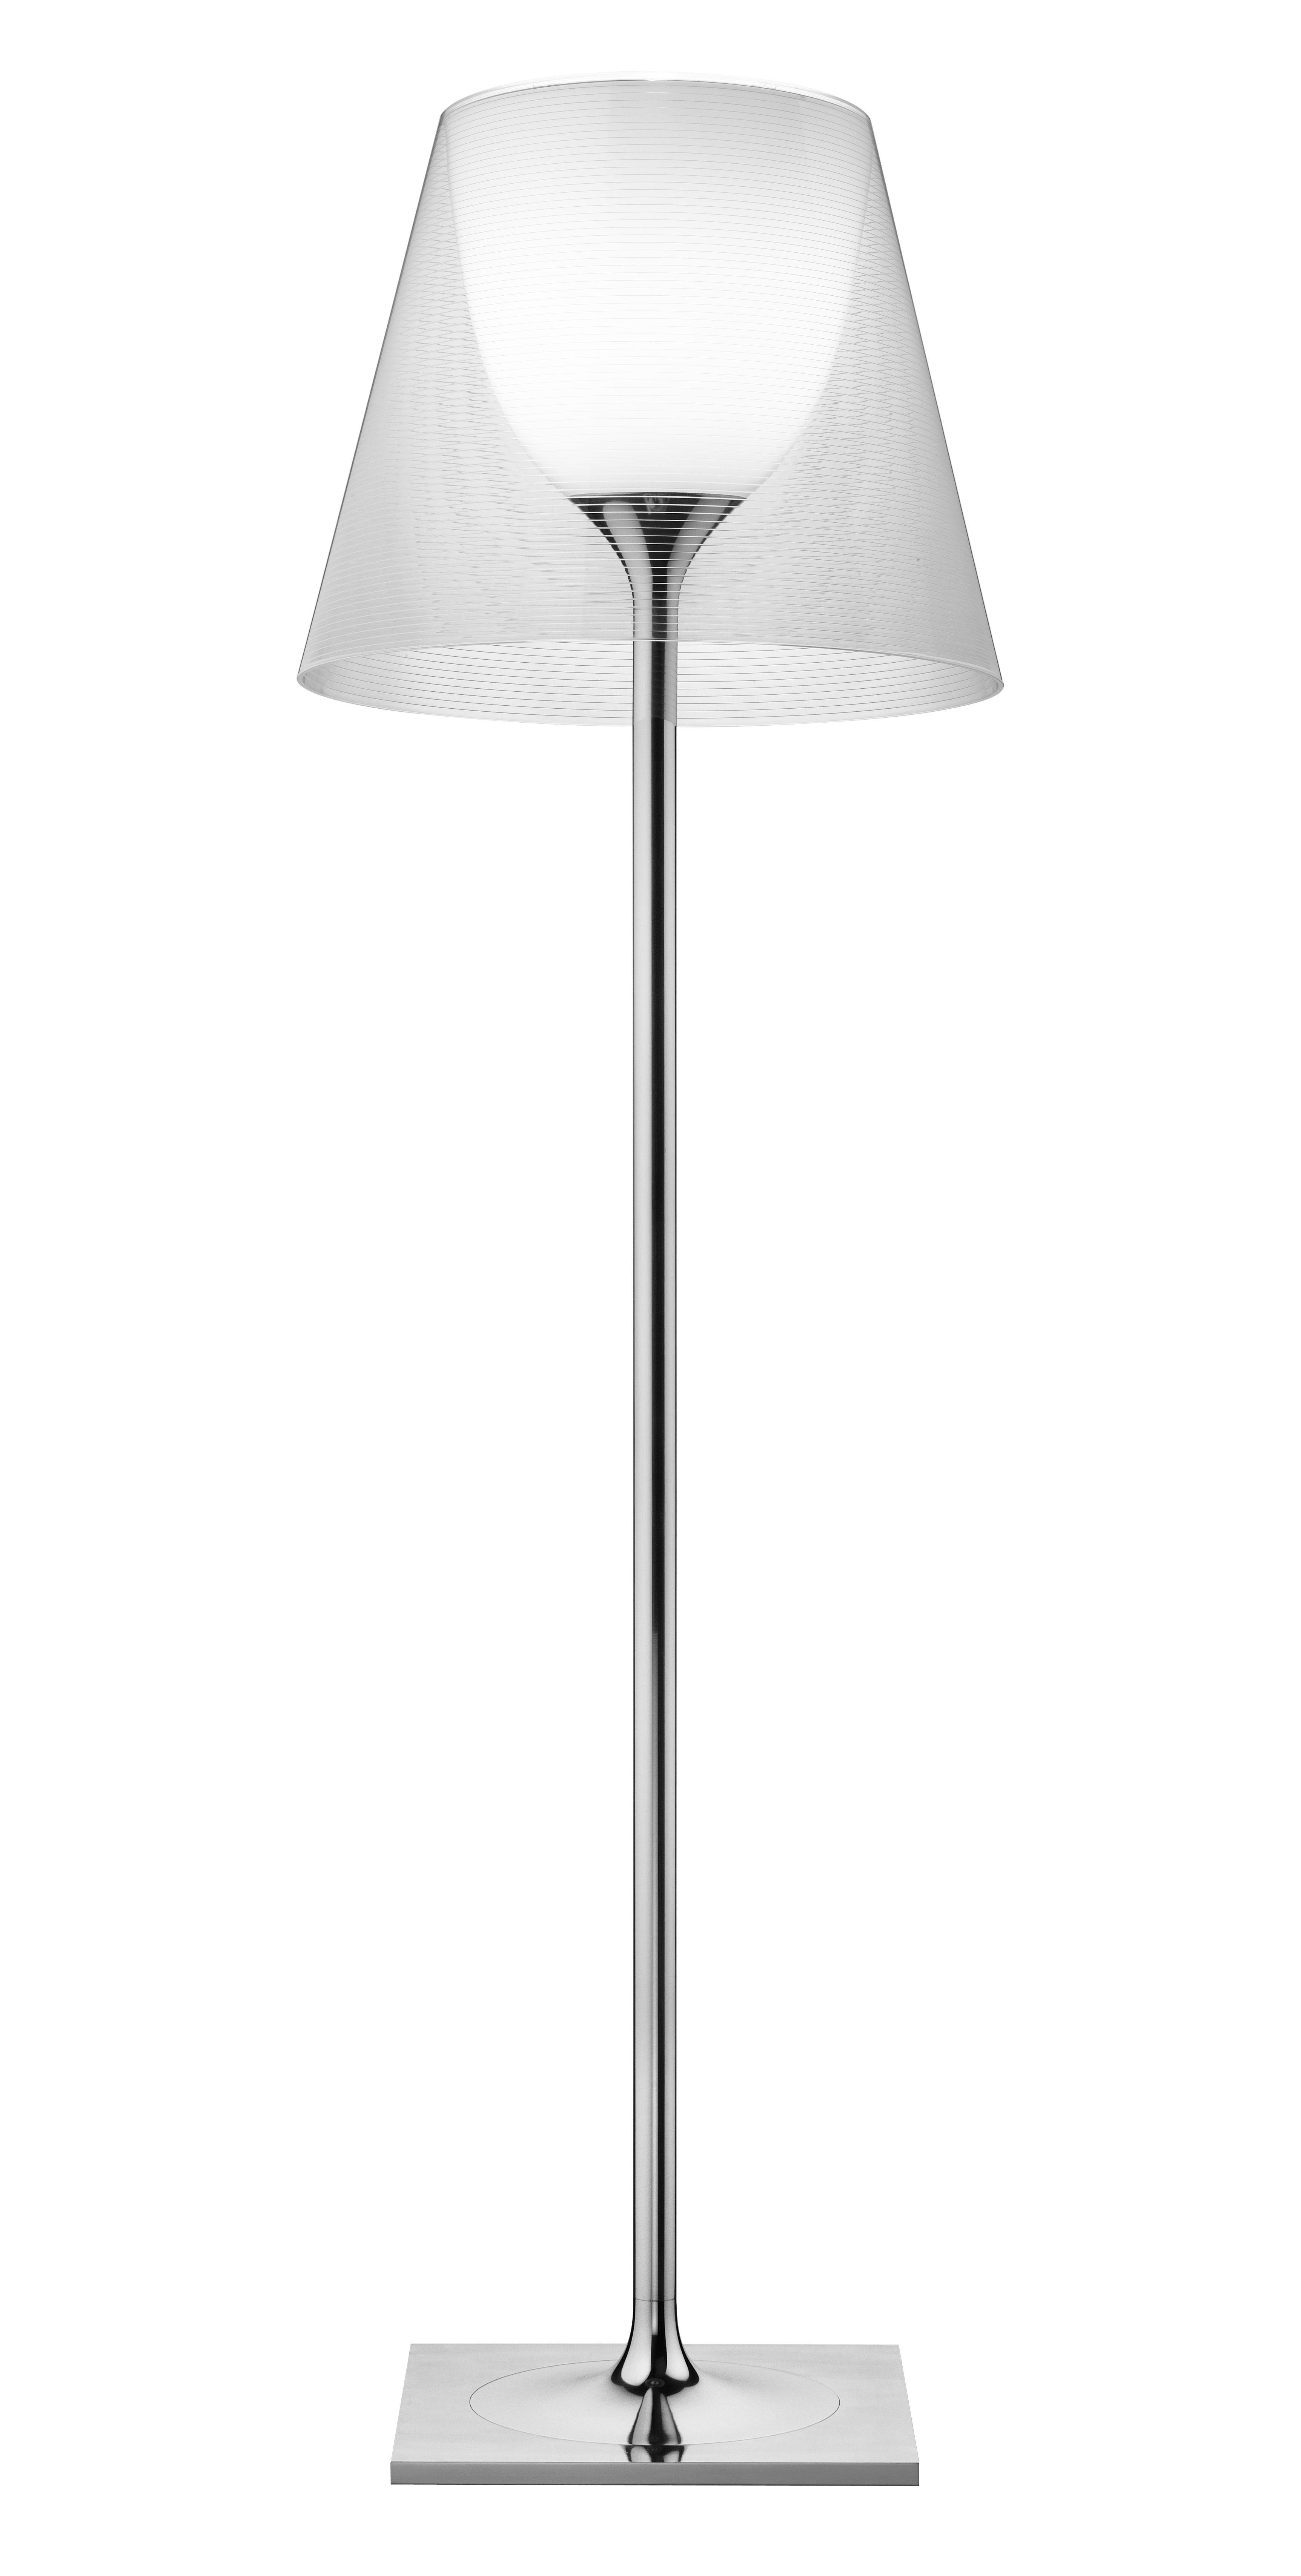 Illuminazione - Lampade da terra - Lampada a stelo K Tribe F3 - H 183 cm di Flos - Trasparente - Alluminio lucido, PMMA